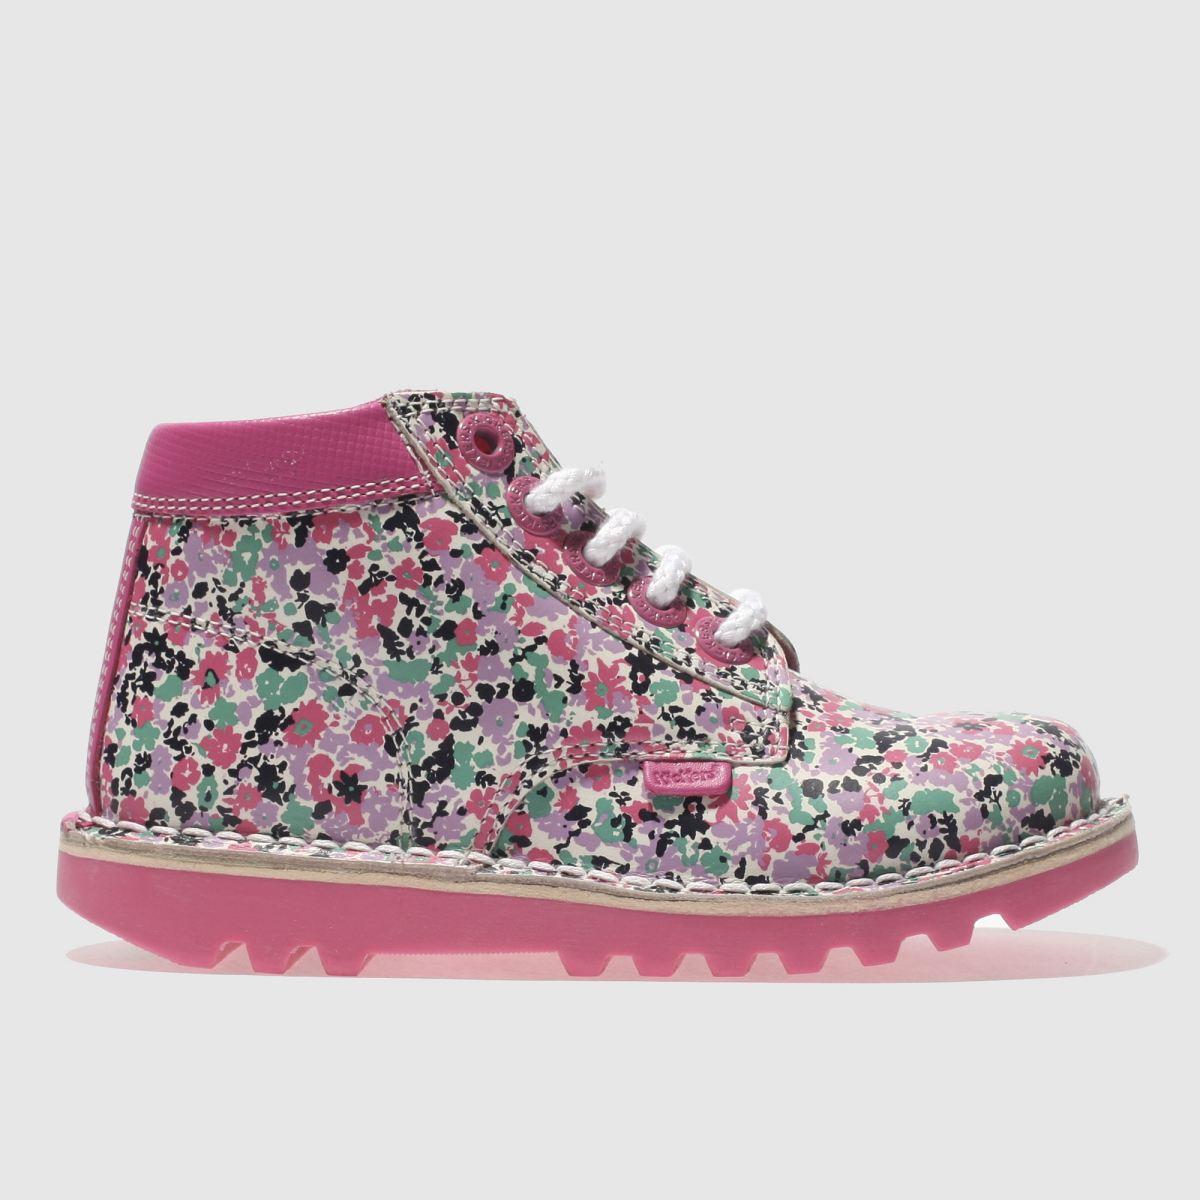 Kickers Pink Kick Hi Joules Girls Toddler Boots